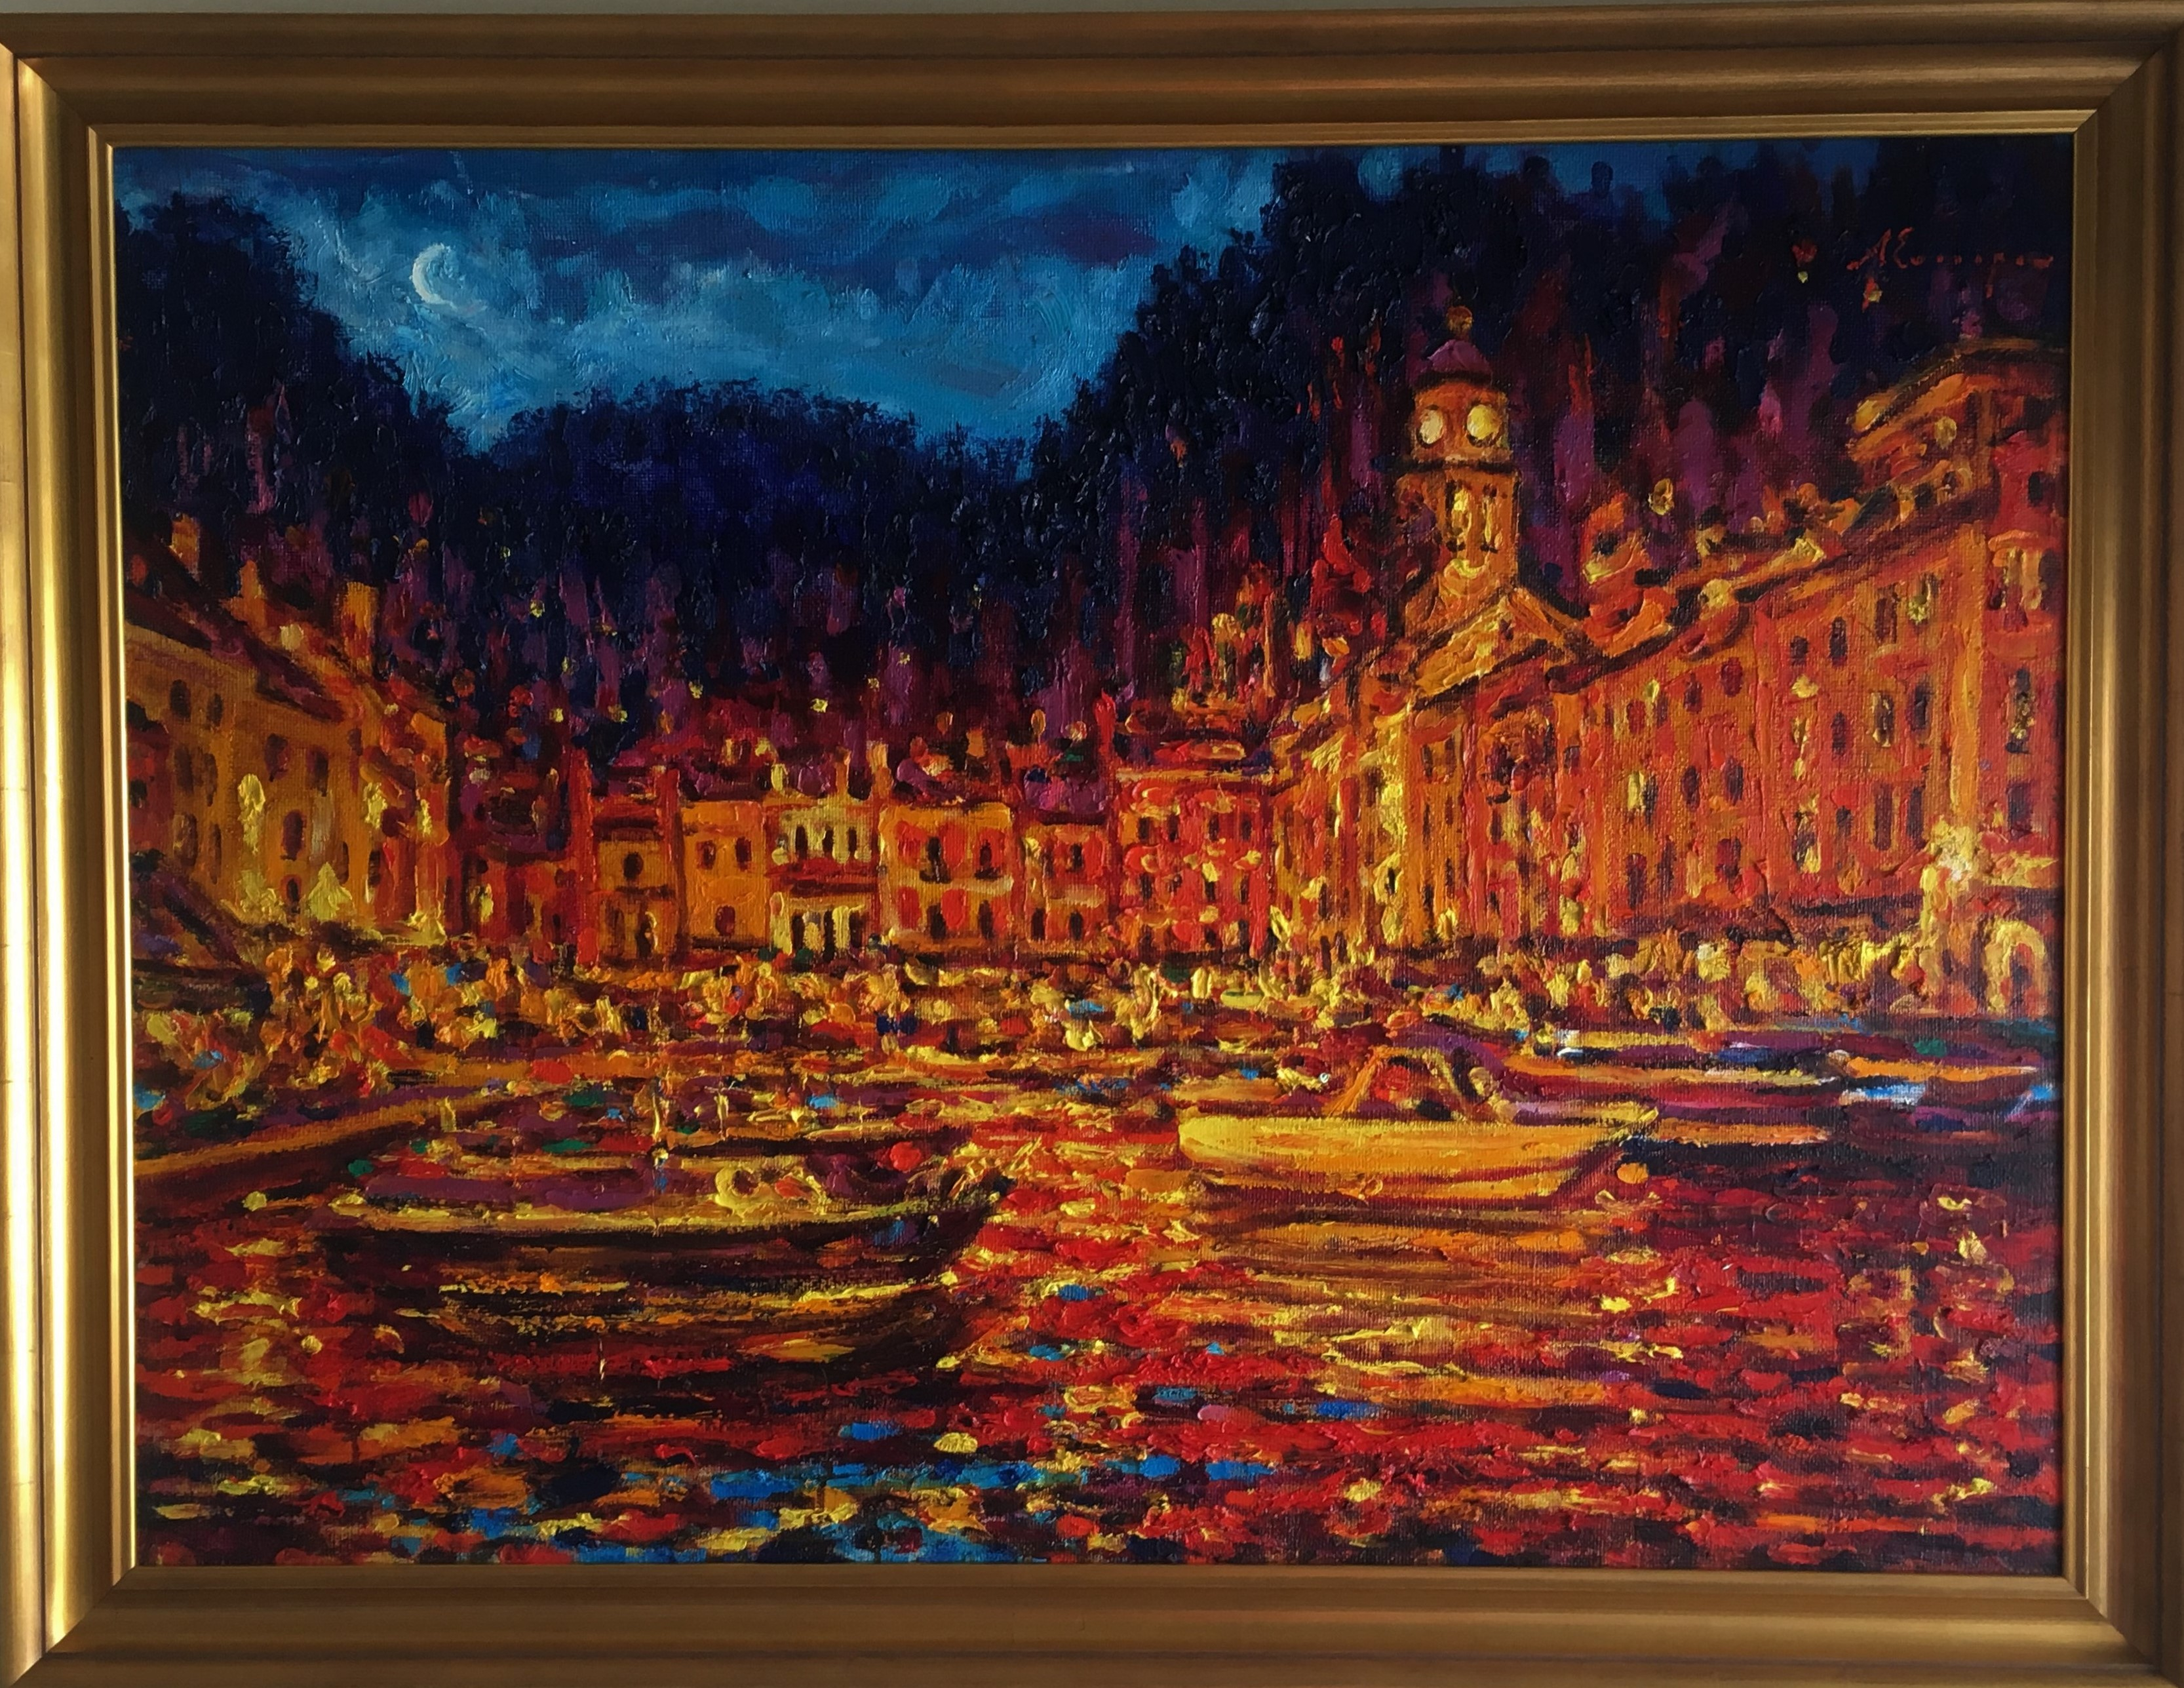 WBD1001 – Portofino Moonlight